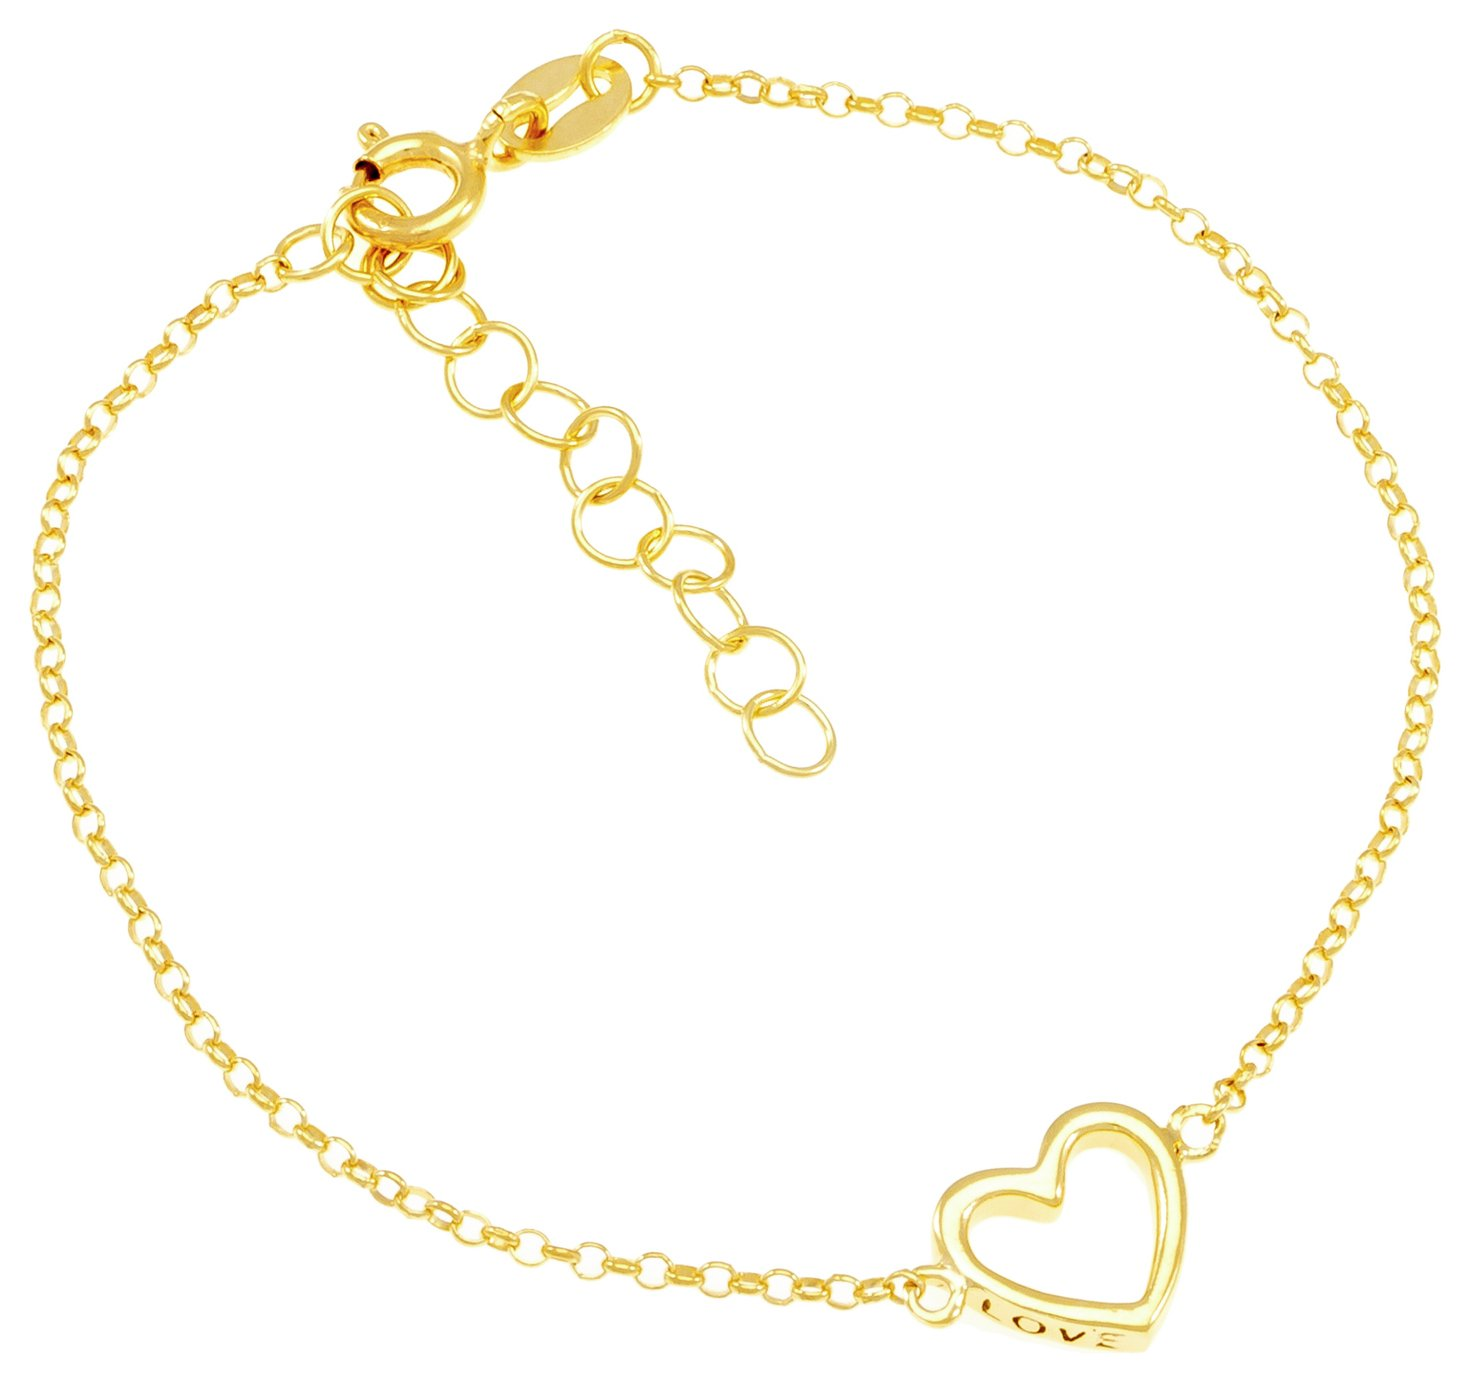 Revere 9ct Gold Plated Sterling Silver Open Heart Bracelet